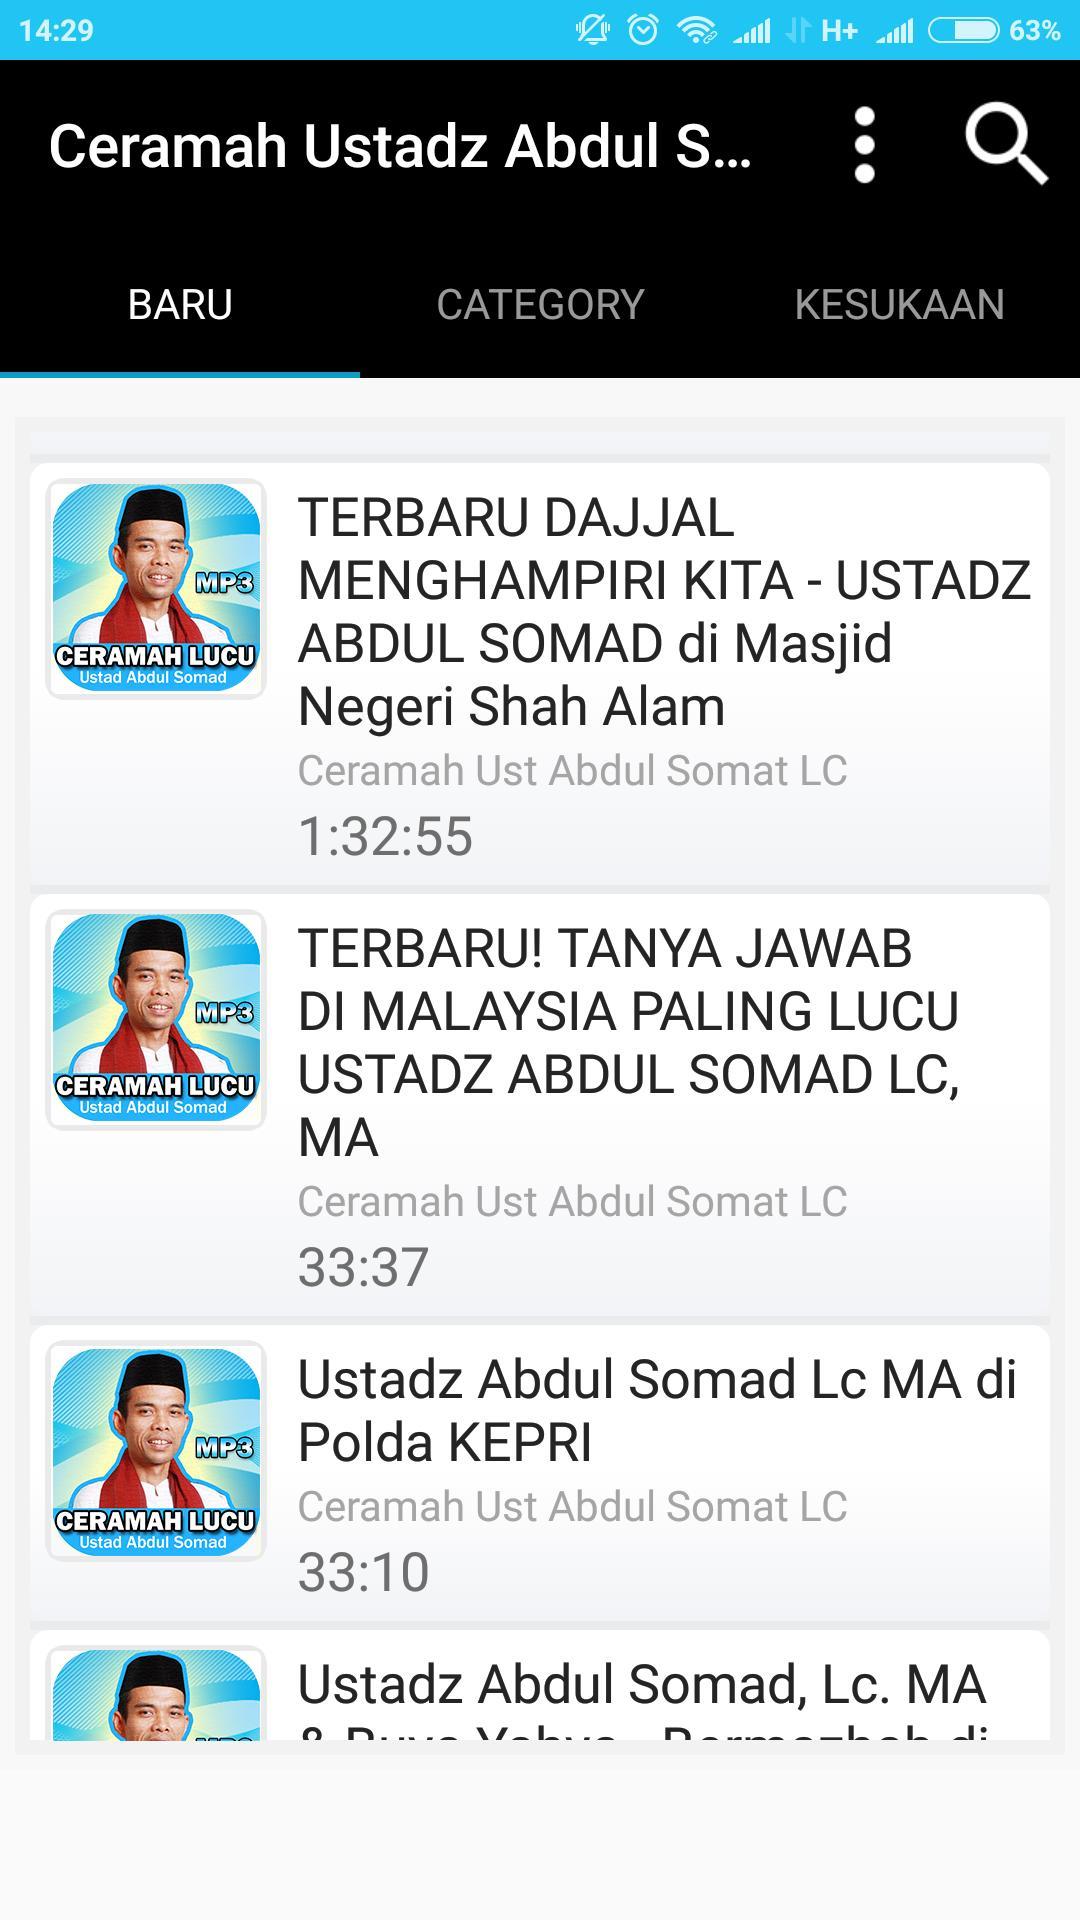 Ceramah Lucu UAS For Android APK Download